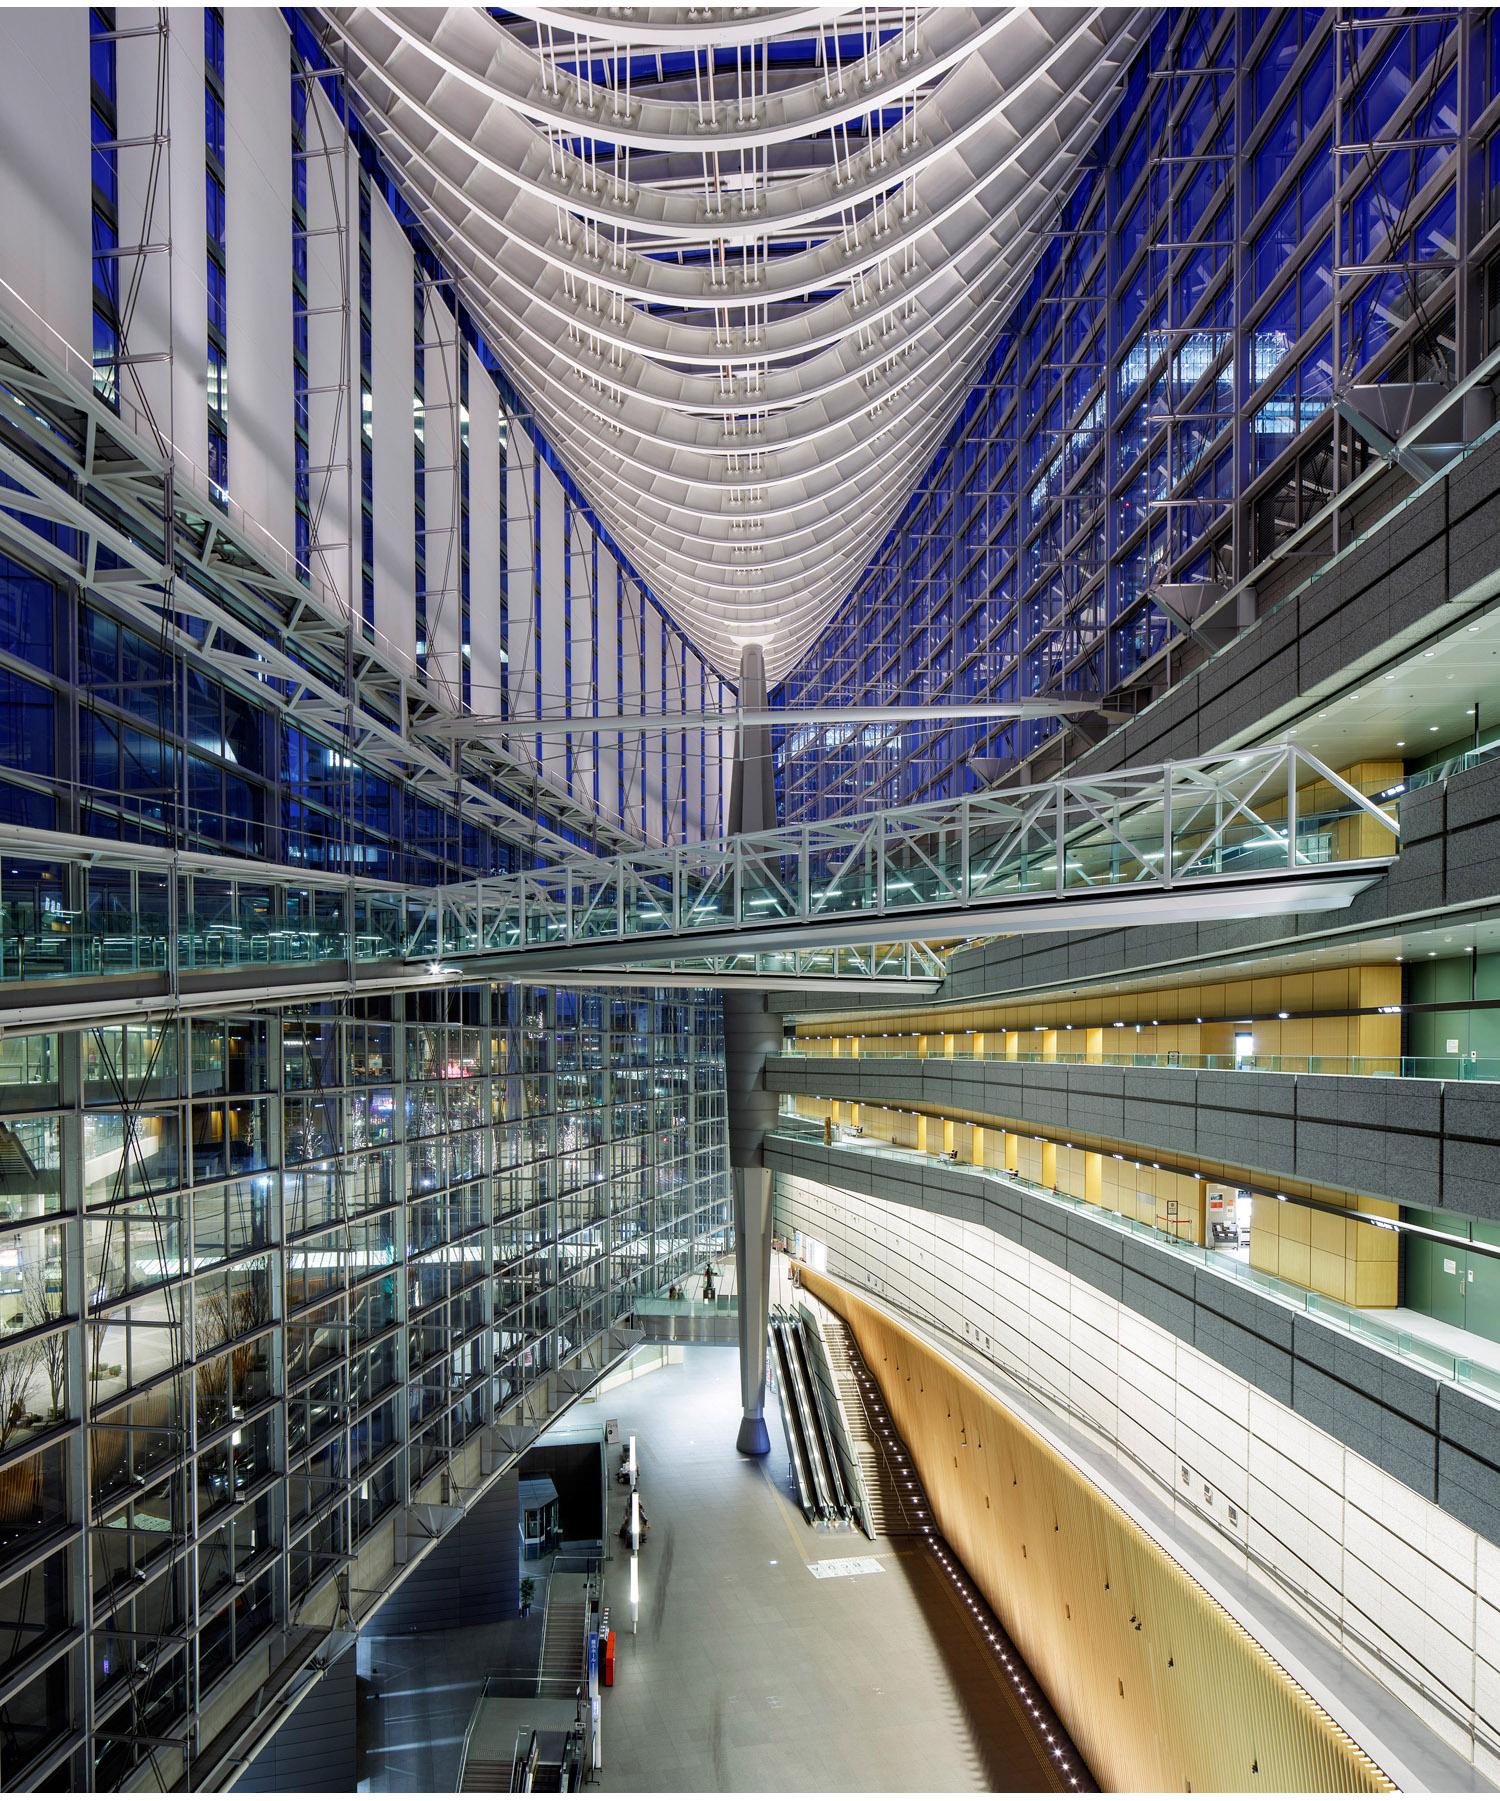 013-Japan-Architecture.jpg